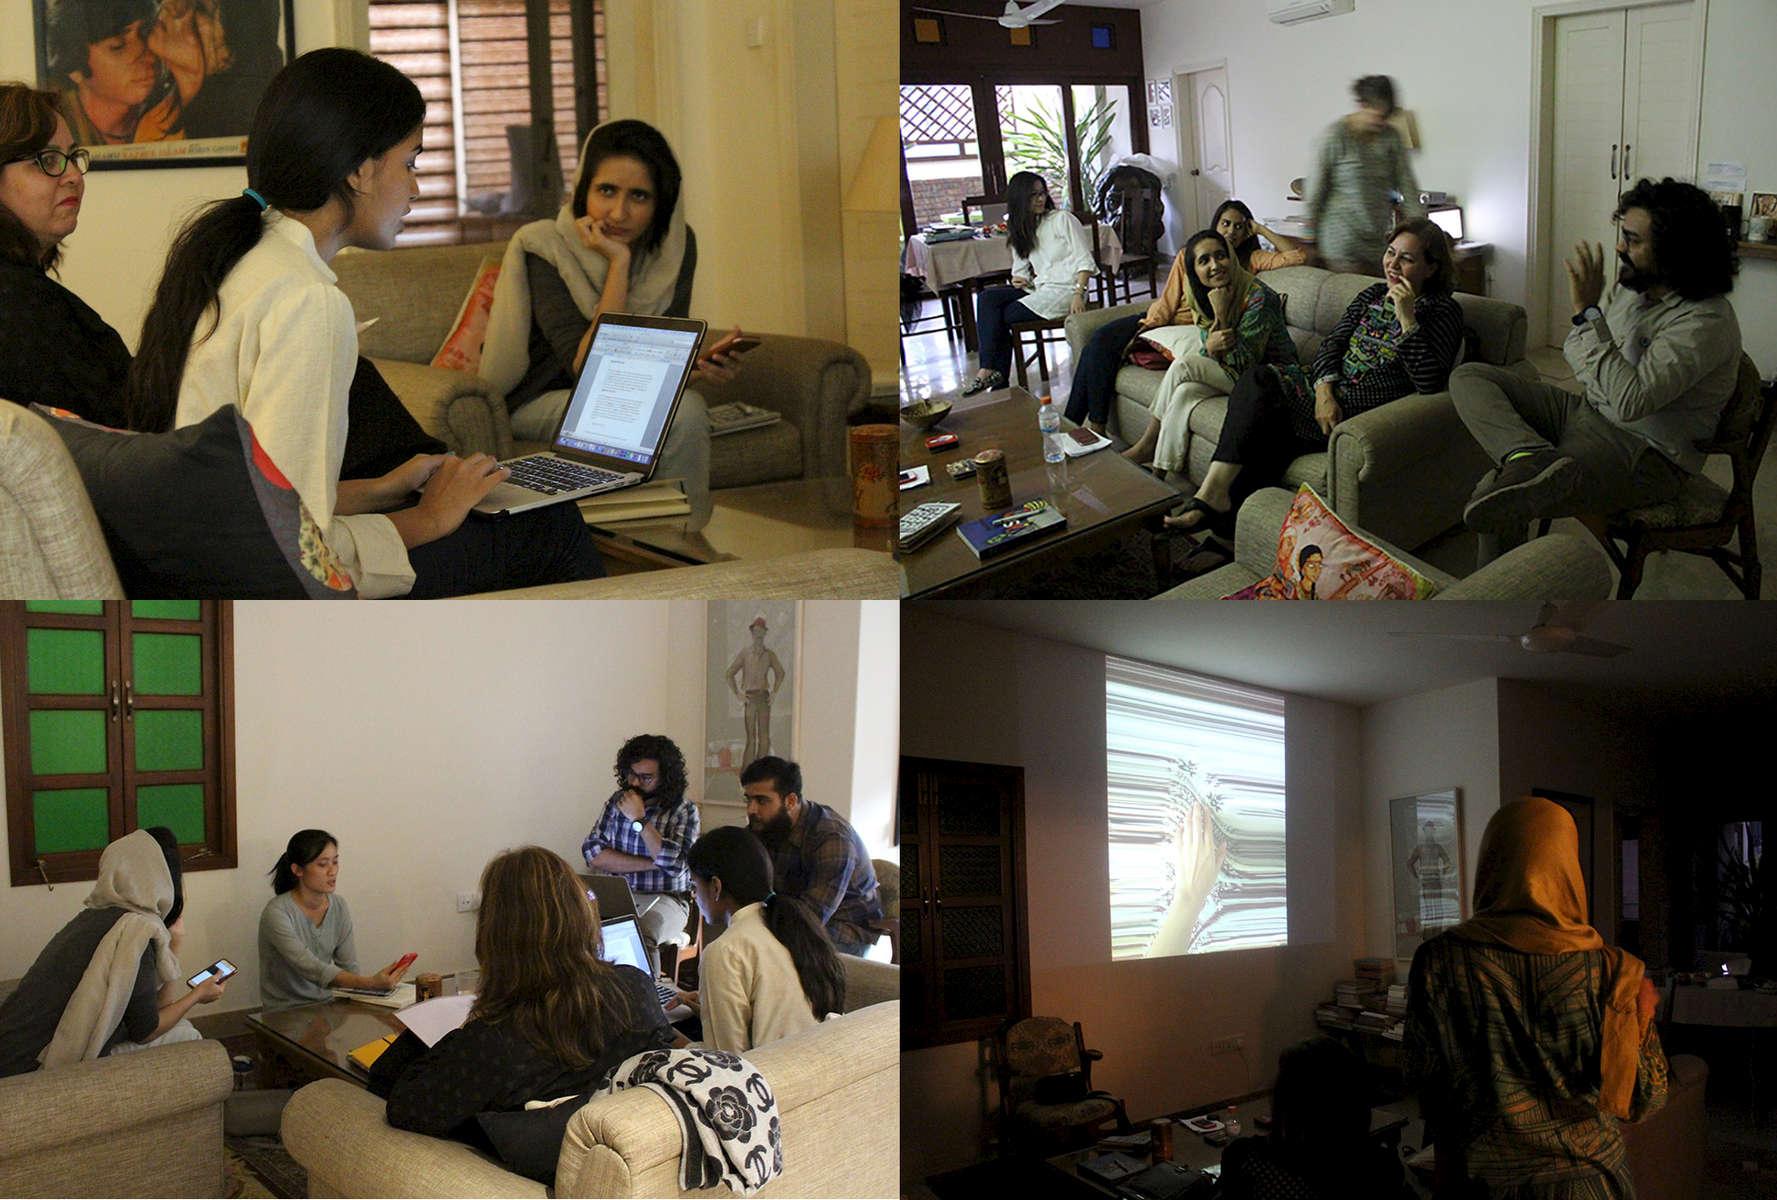 Feb-Mar: Initiated a 4 week workshop with fellow artists in Karachi - Conversation in Image-Making at Vasl, and a photography workshop for school children with the Orangi Pilot Project, Karachi.Conversation in image-making includes artists Samina Islam, Feroza Gulzar, Mujtaba Asif, Myra Javaid, Zoral Khurram, Madiha Aijaz.